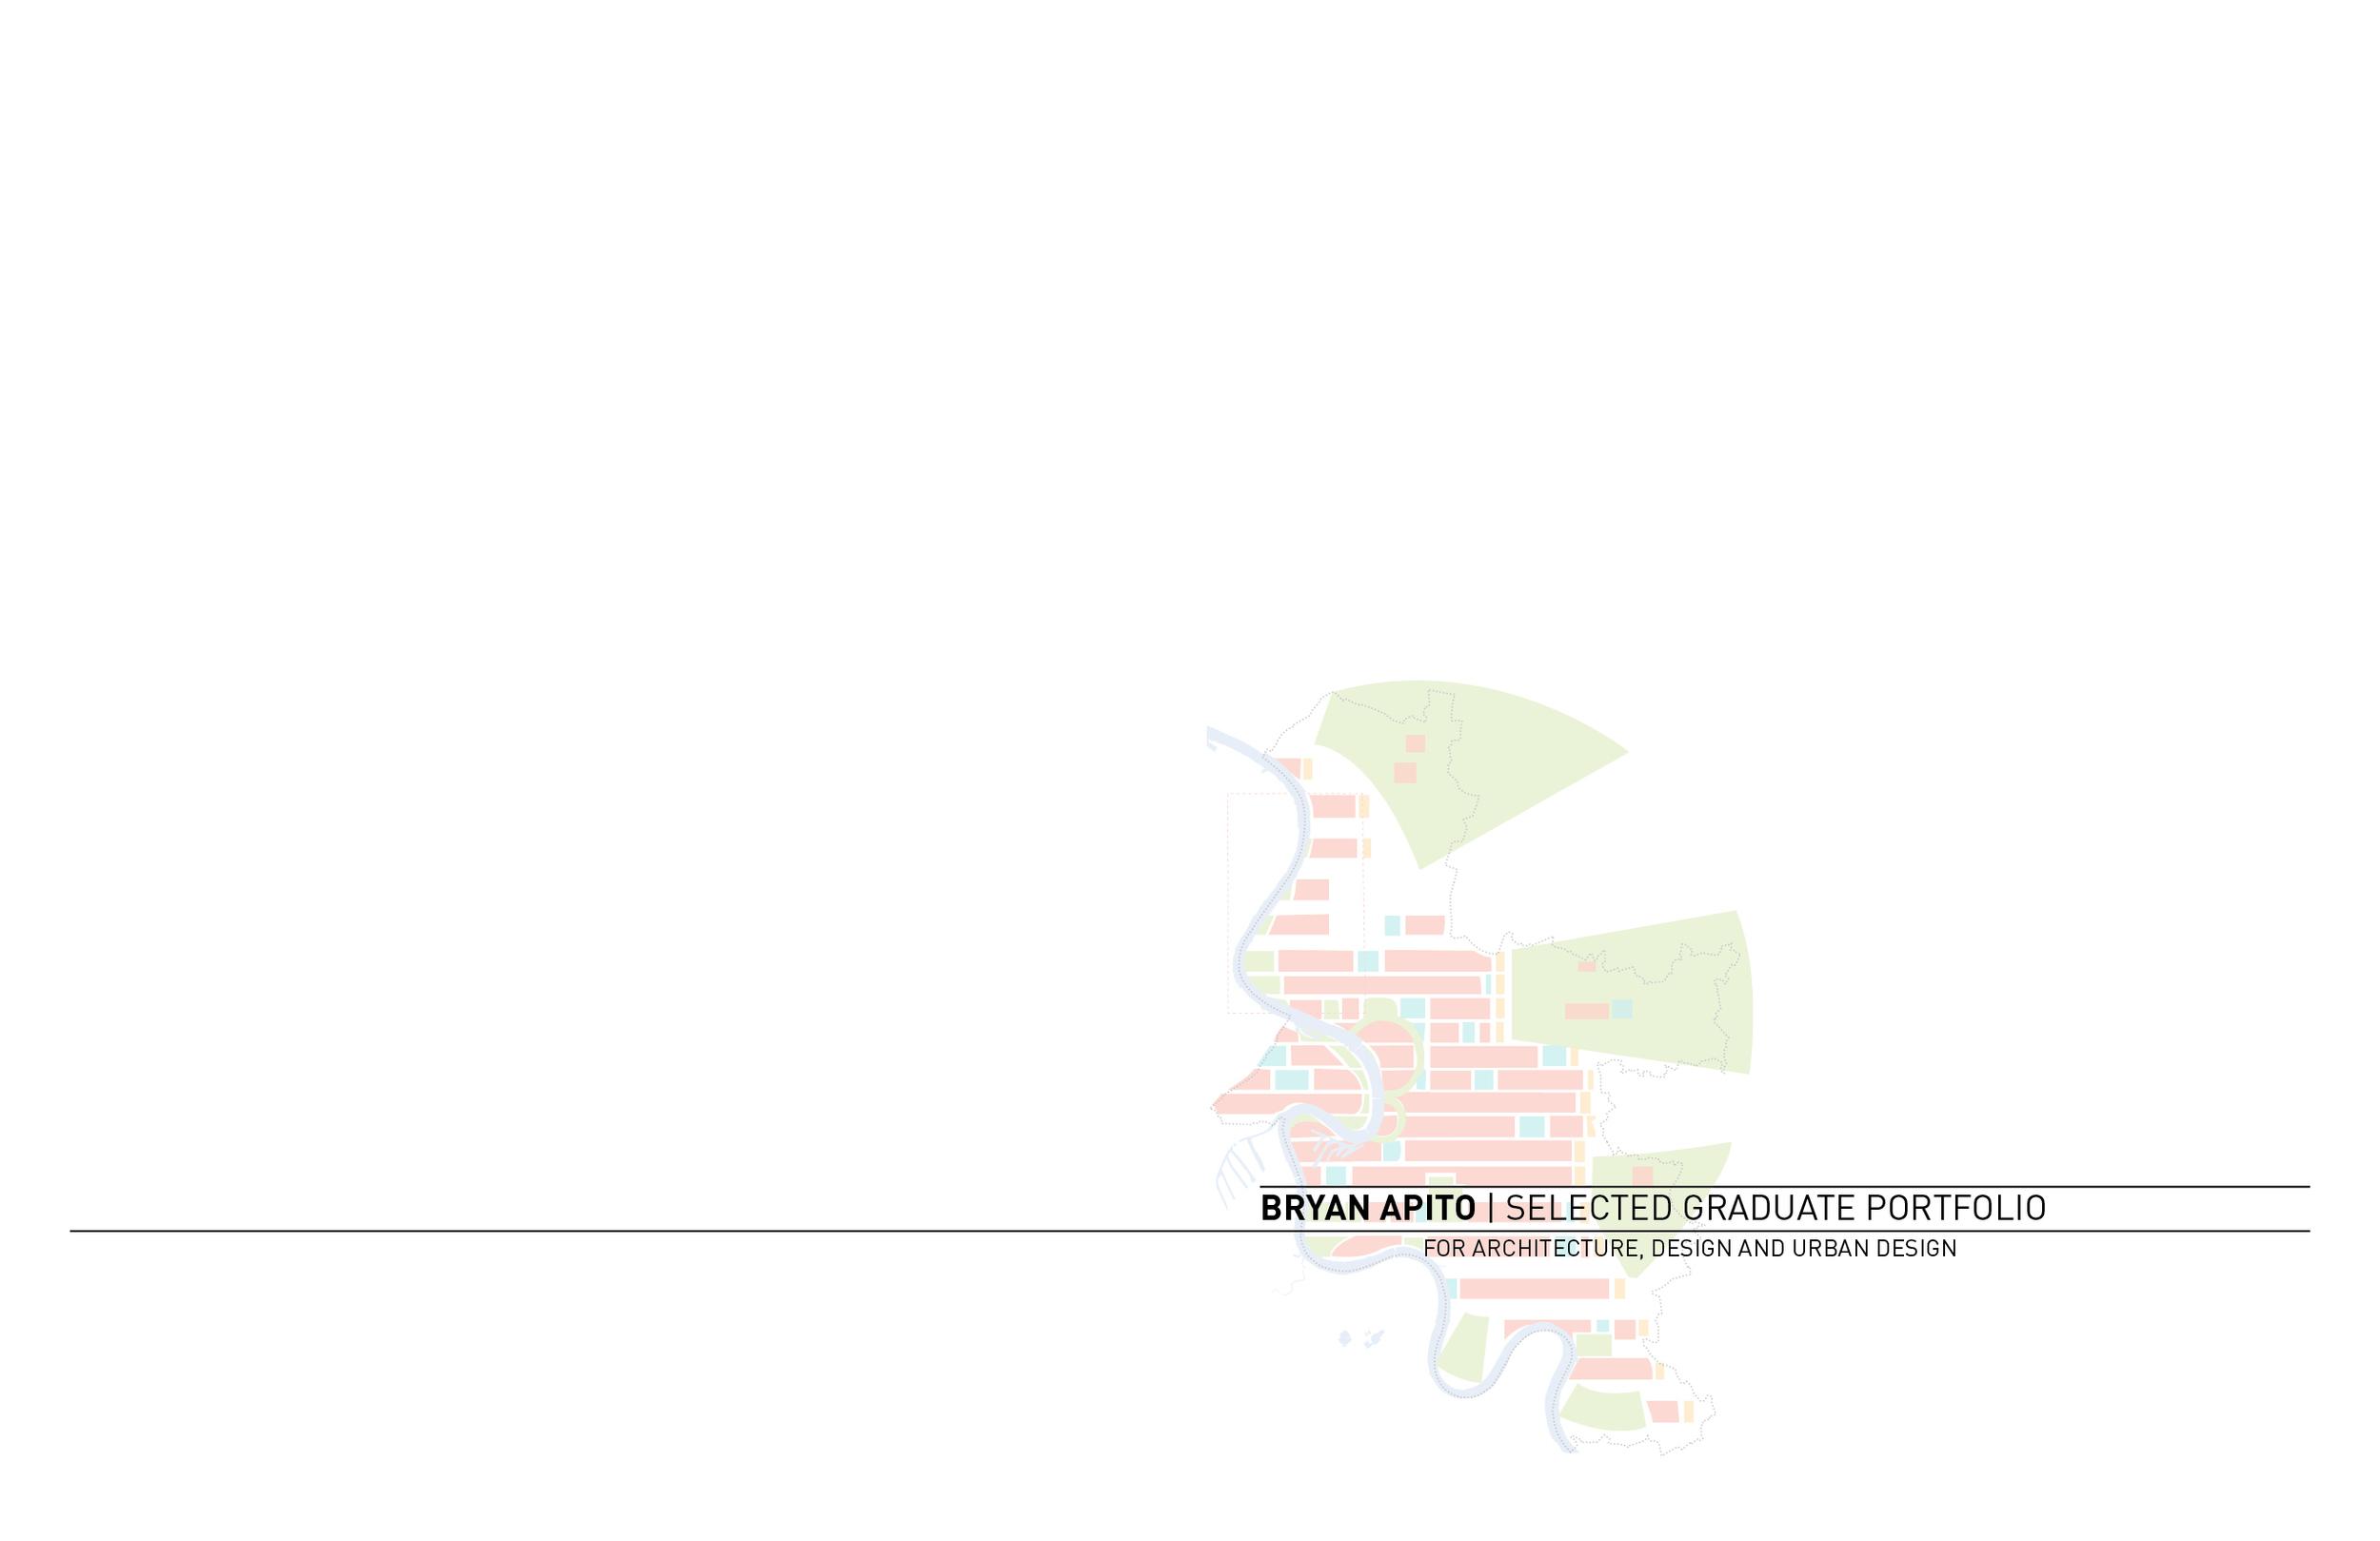 Bryan Apito Fast Web 1.jpg